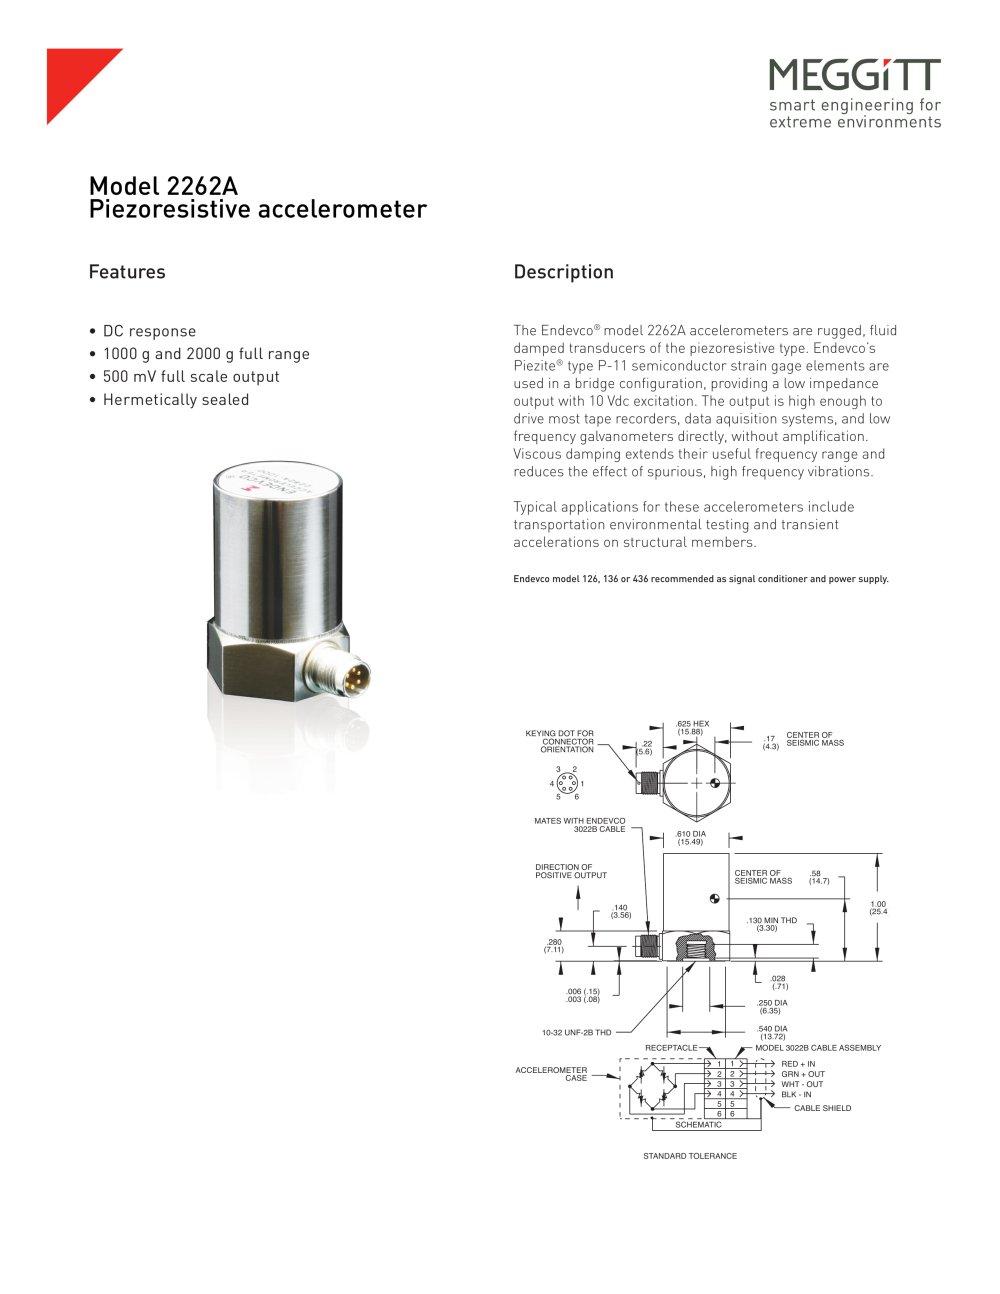 Meggitt Sensing Systems Endevco Model 2262a Piezoresistive Accelerometer Schematic Accelerometers 1 2 Pages